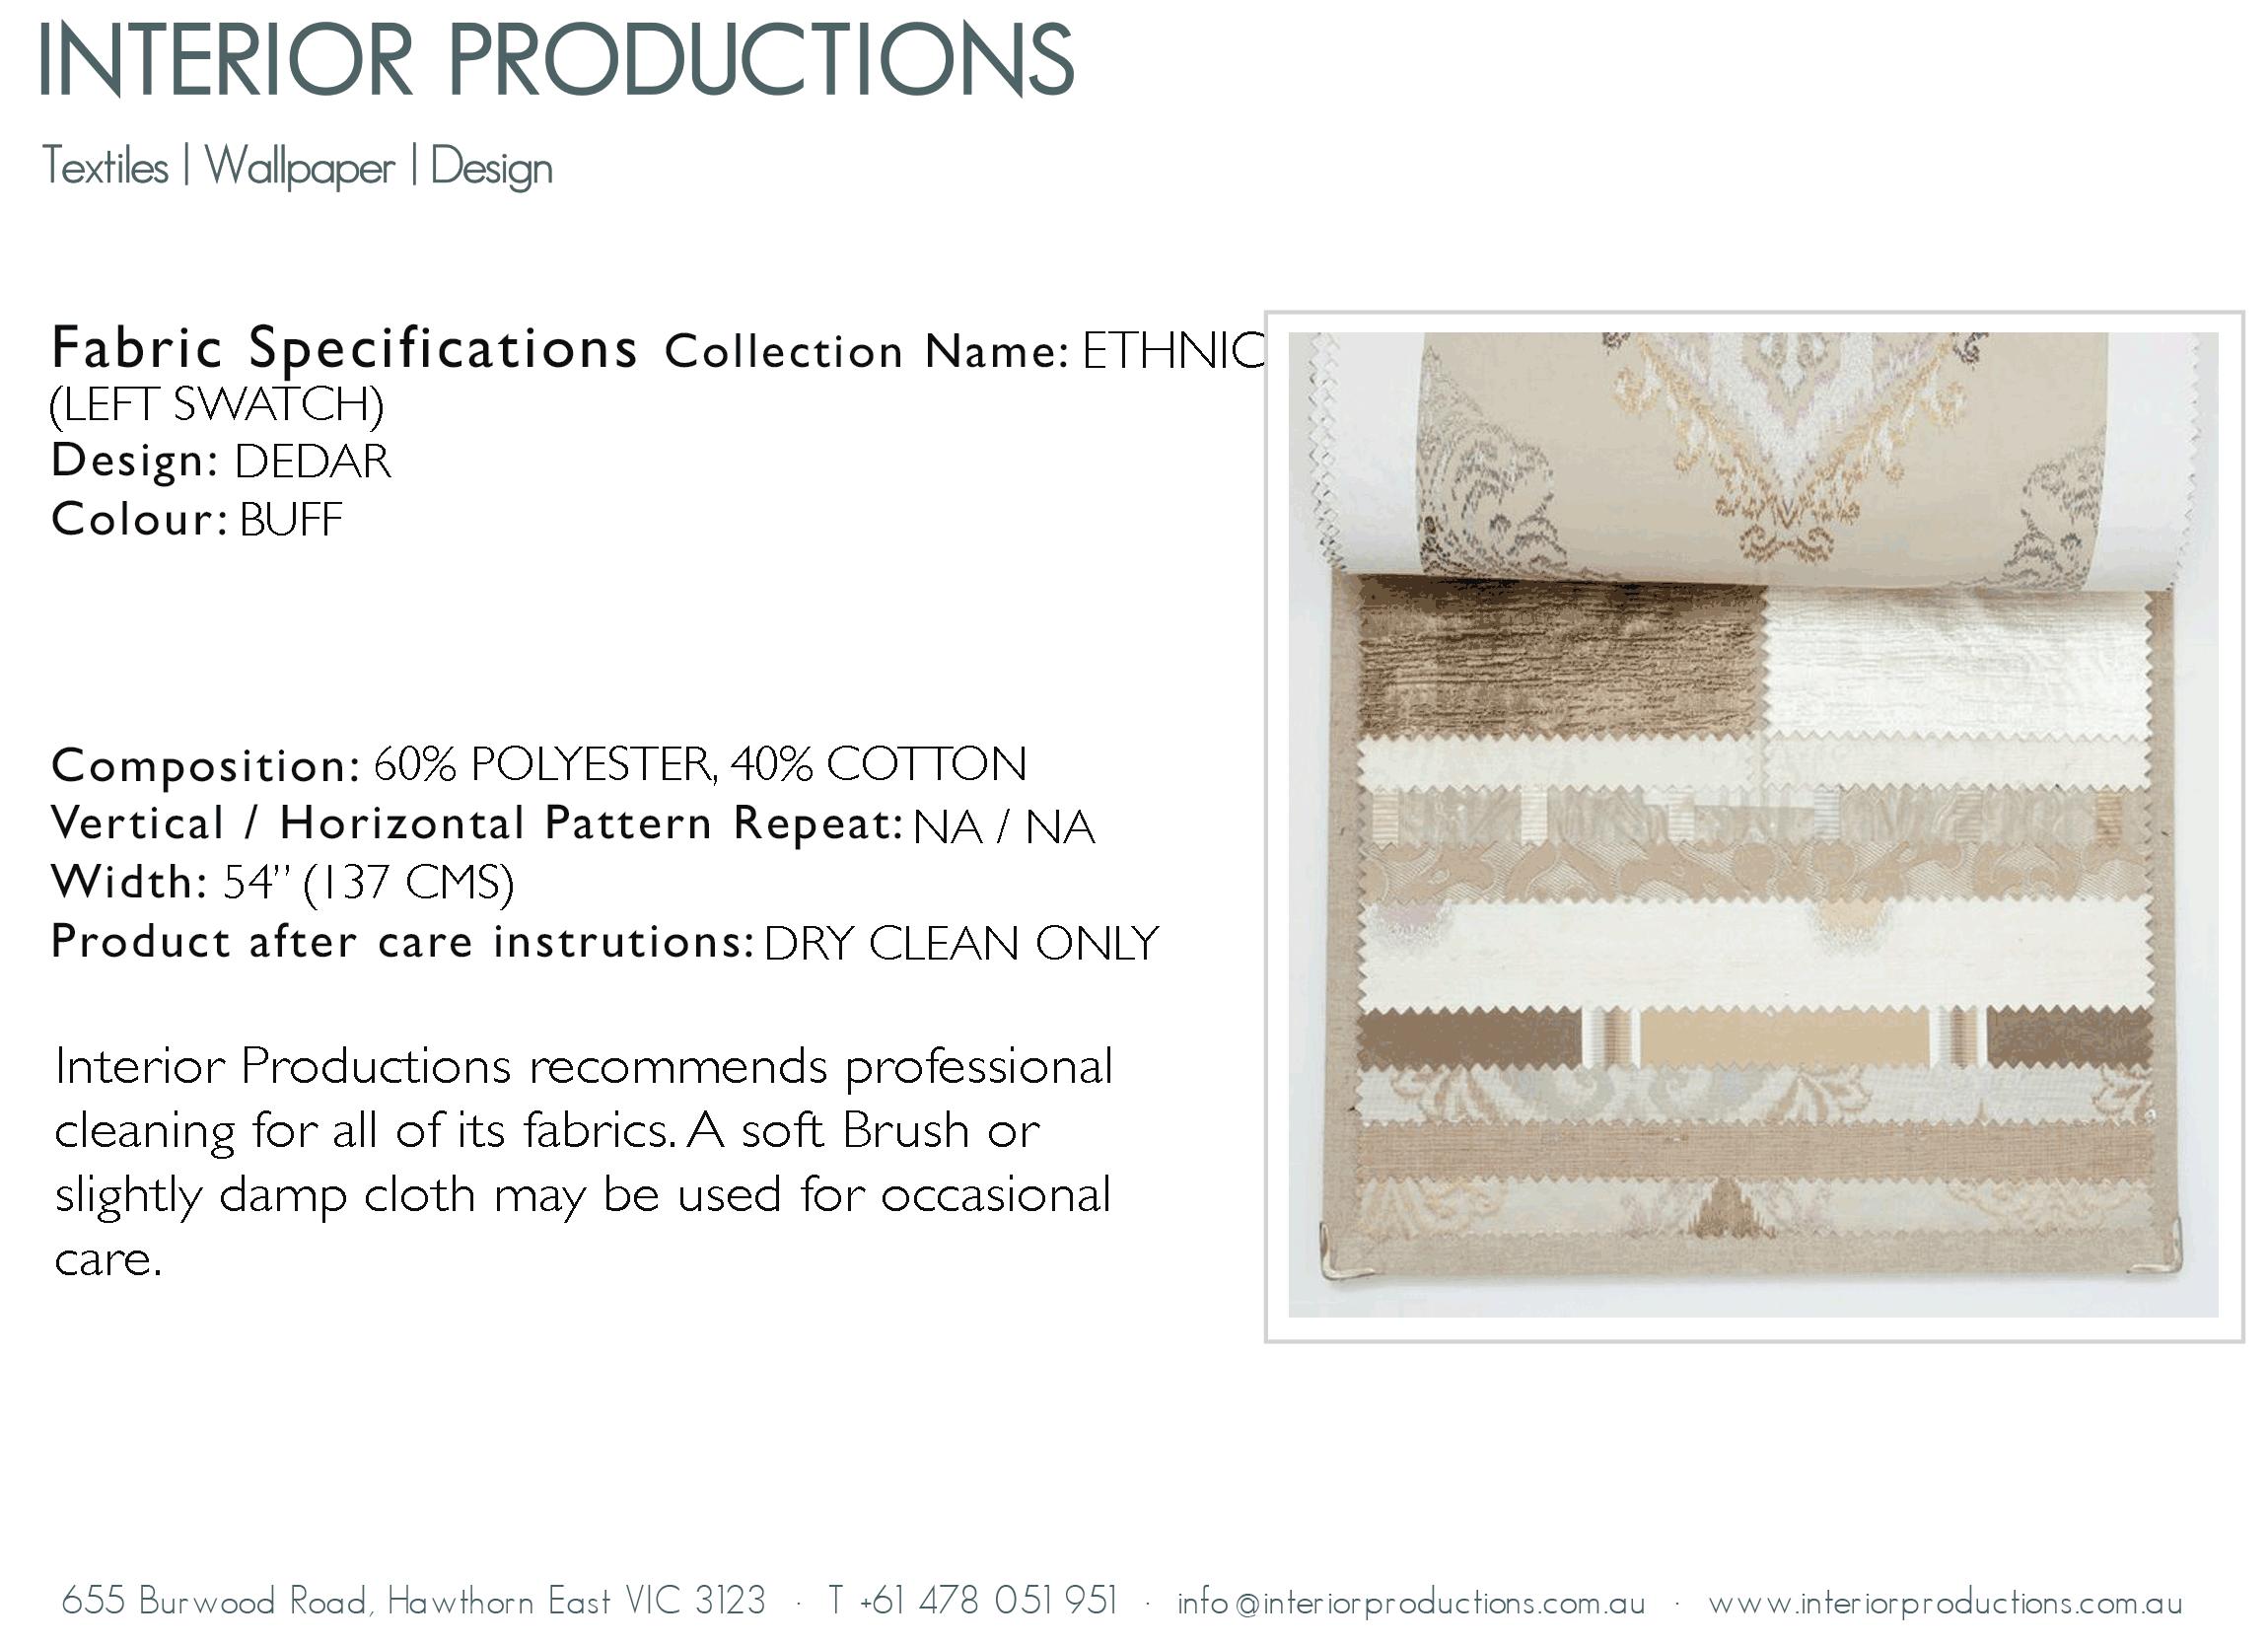 interior_productions_DEDAR---BUFF